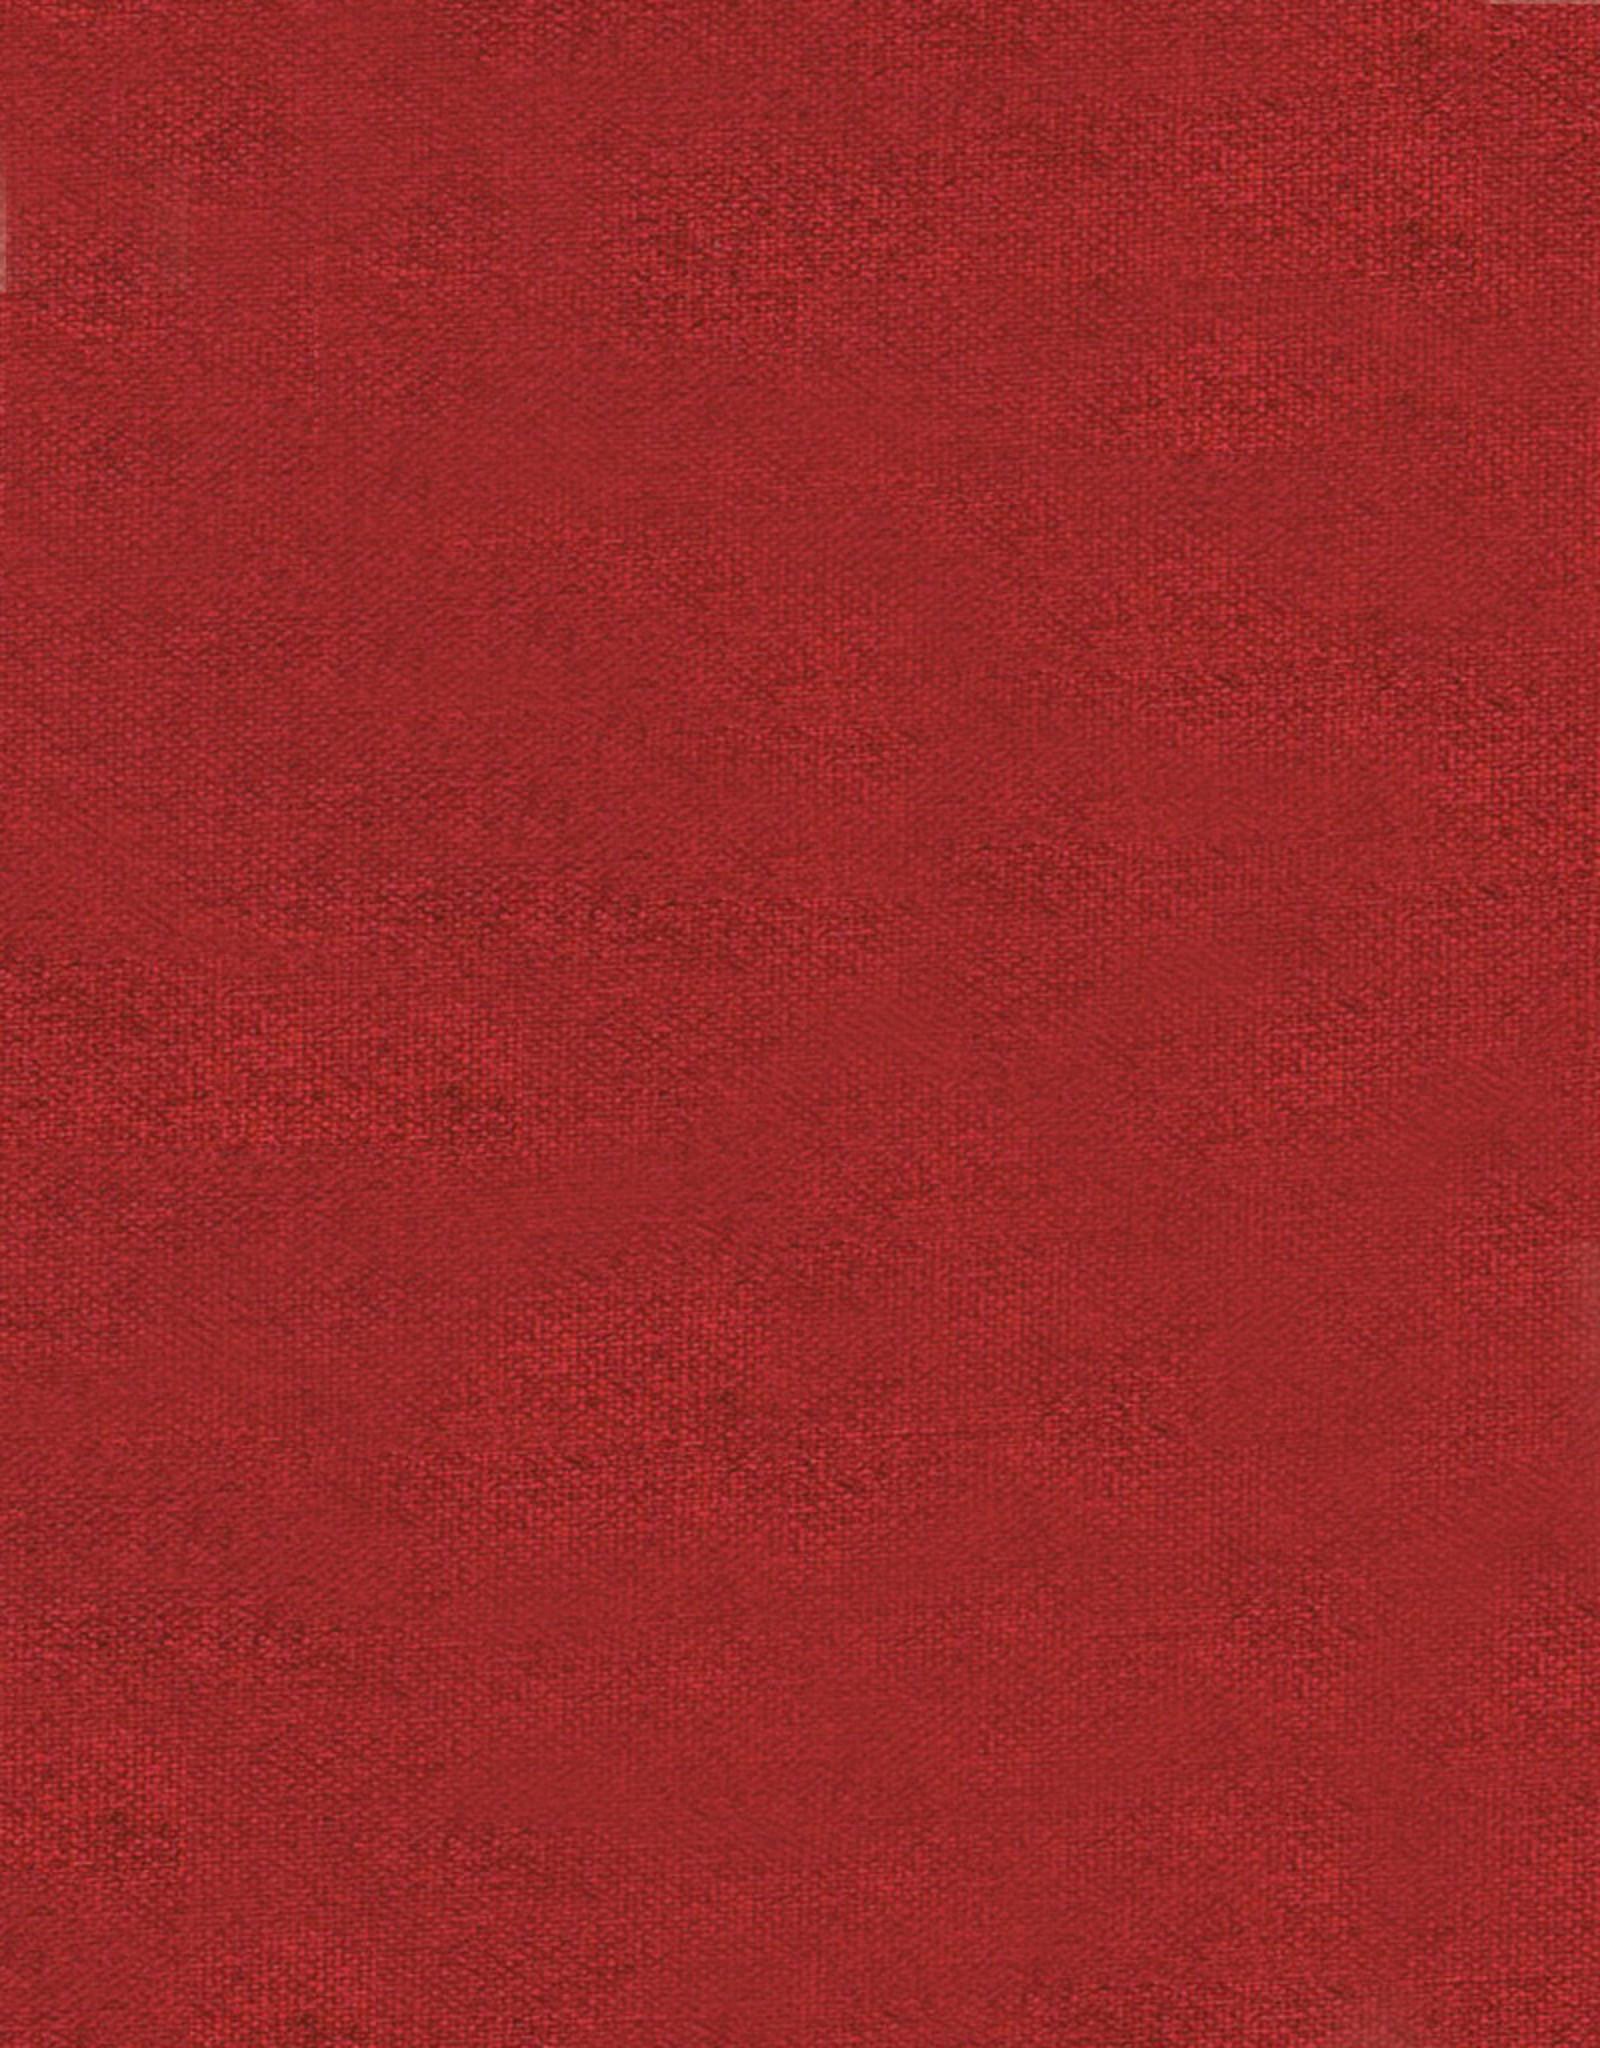 Jacquard Lumiere Crimson